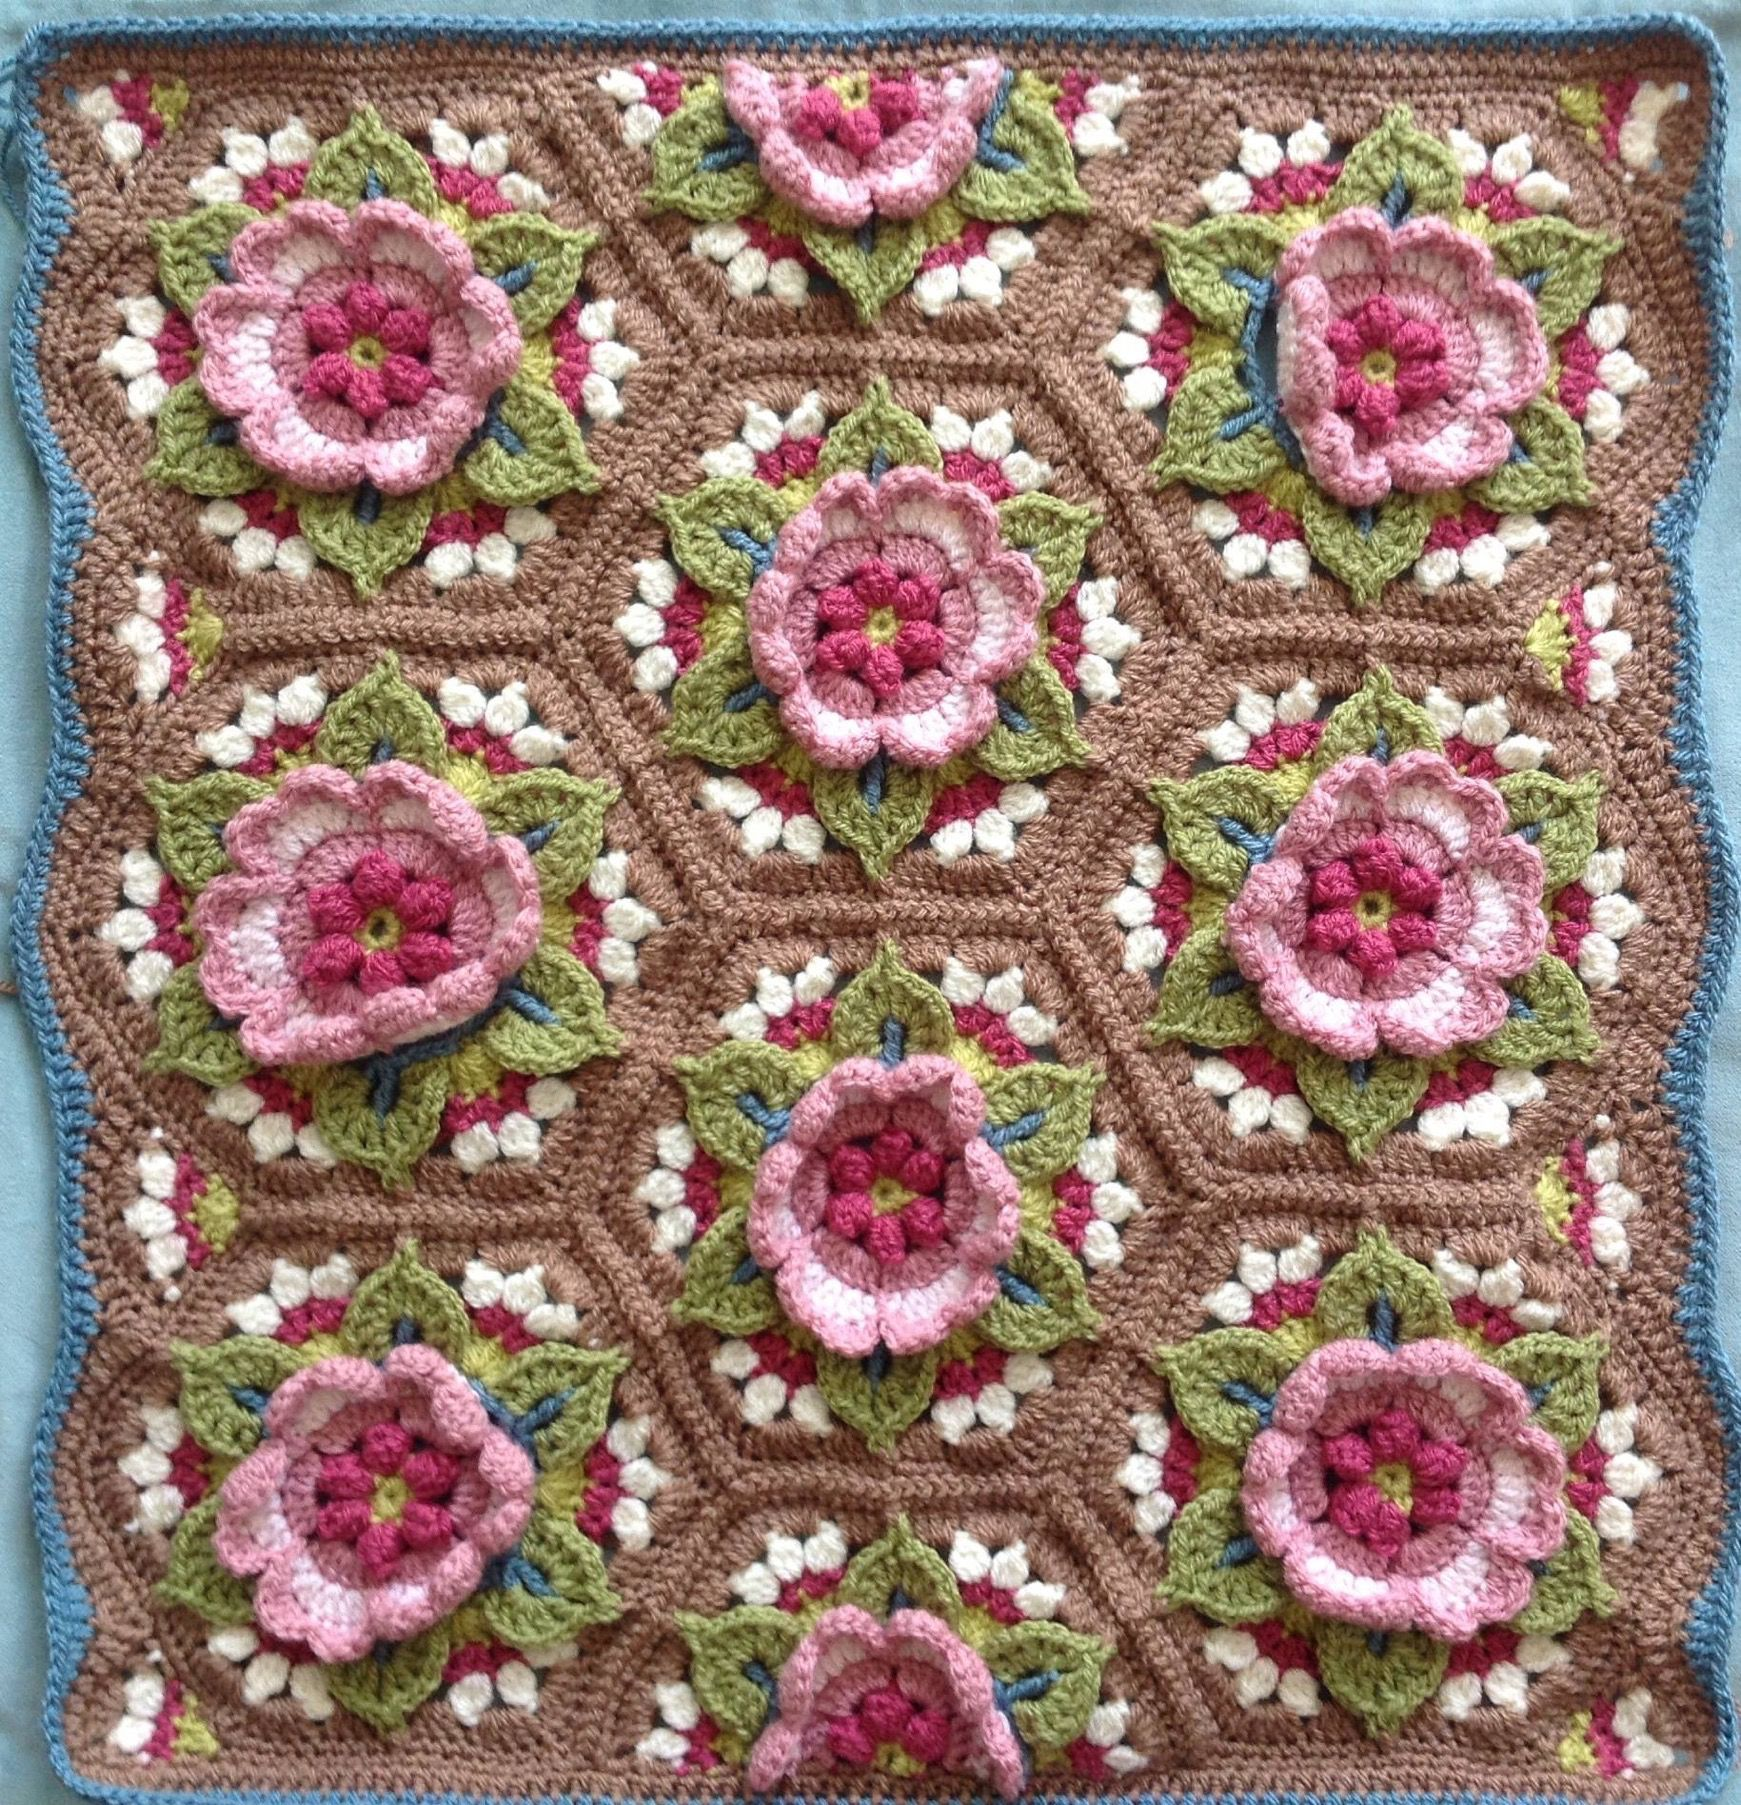 Rose Afghan | Crochet Patternsc | Pinterest | Häkeldecke, Häkeln und ...